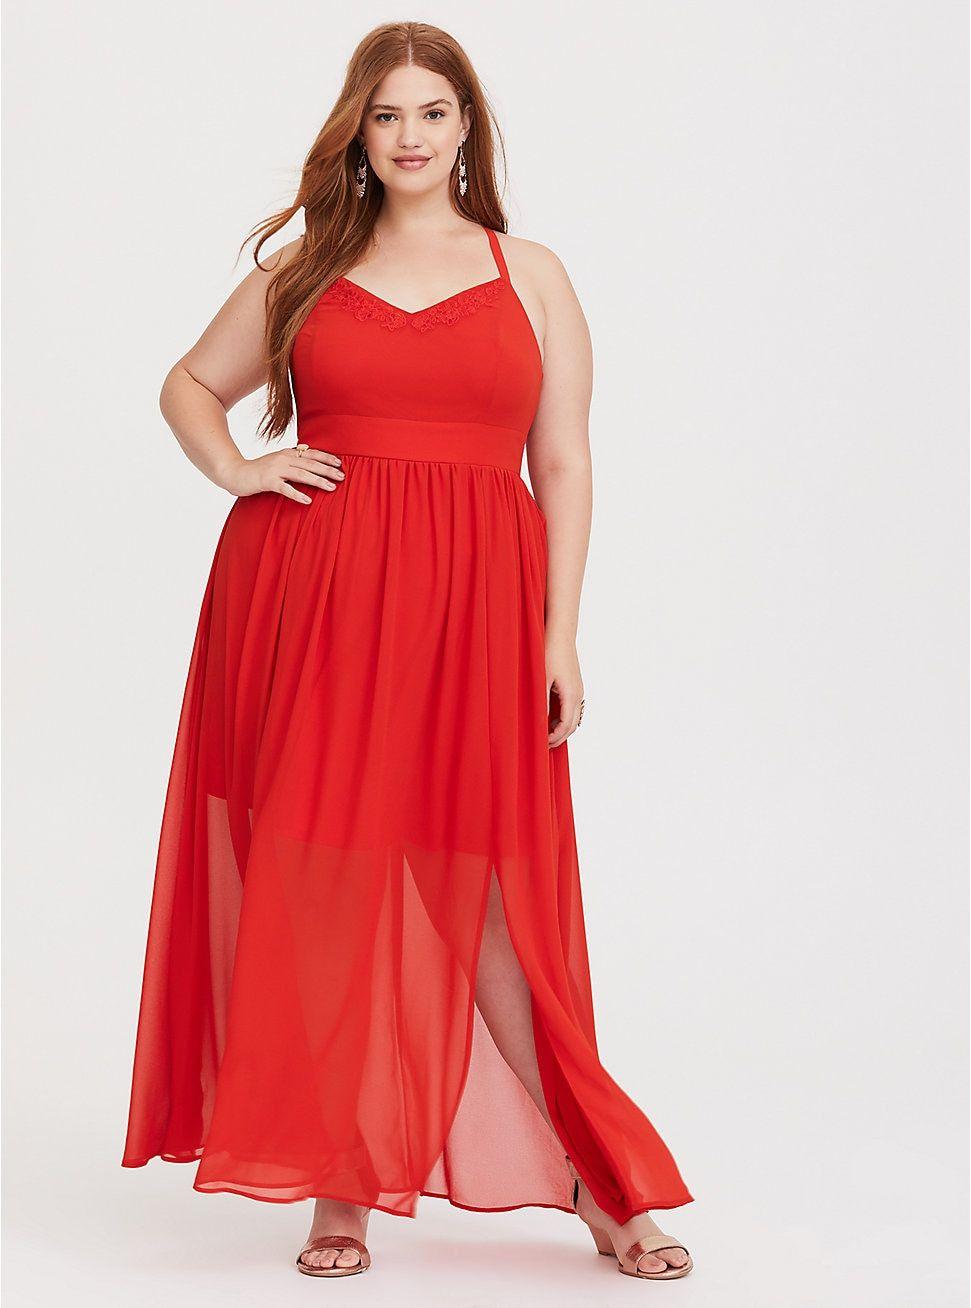 dc3376cec02 Plus Size Orange Embroidered Chiffon Maxi Dress